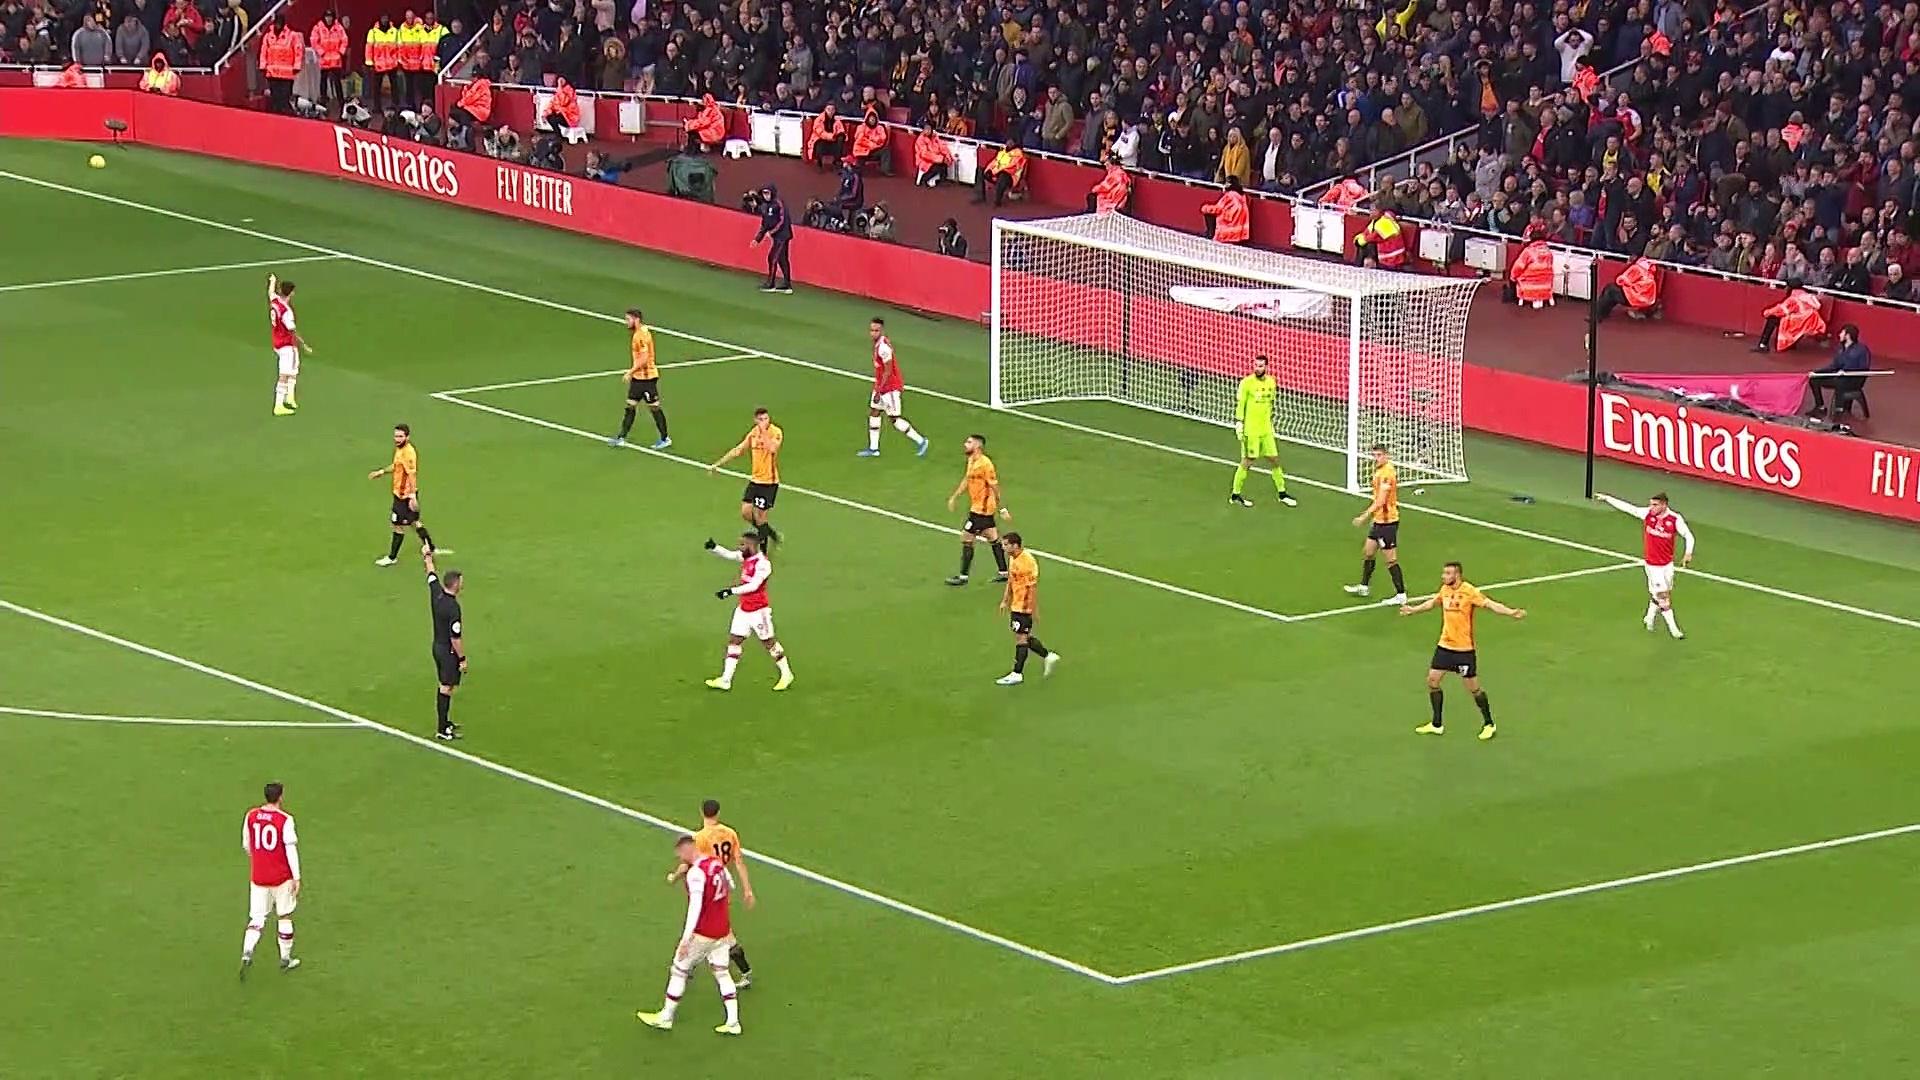 11. Hafta / Arsenal - Wolverhampton: 1-1 (Özet)